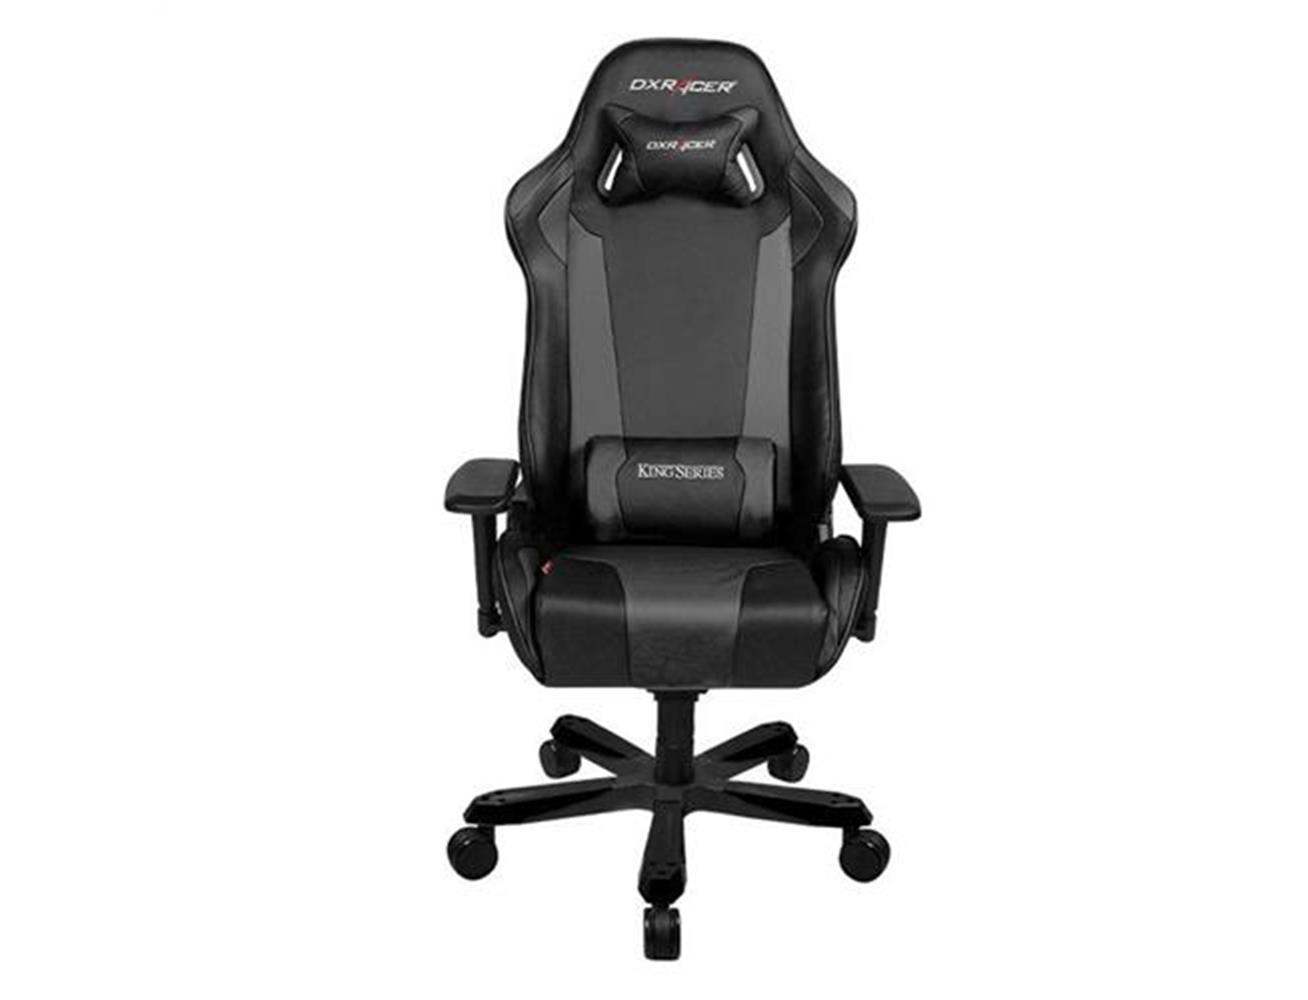 DXRacer King Series Gaming Chair - Black| Blink Kuwait